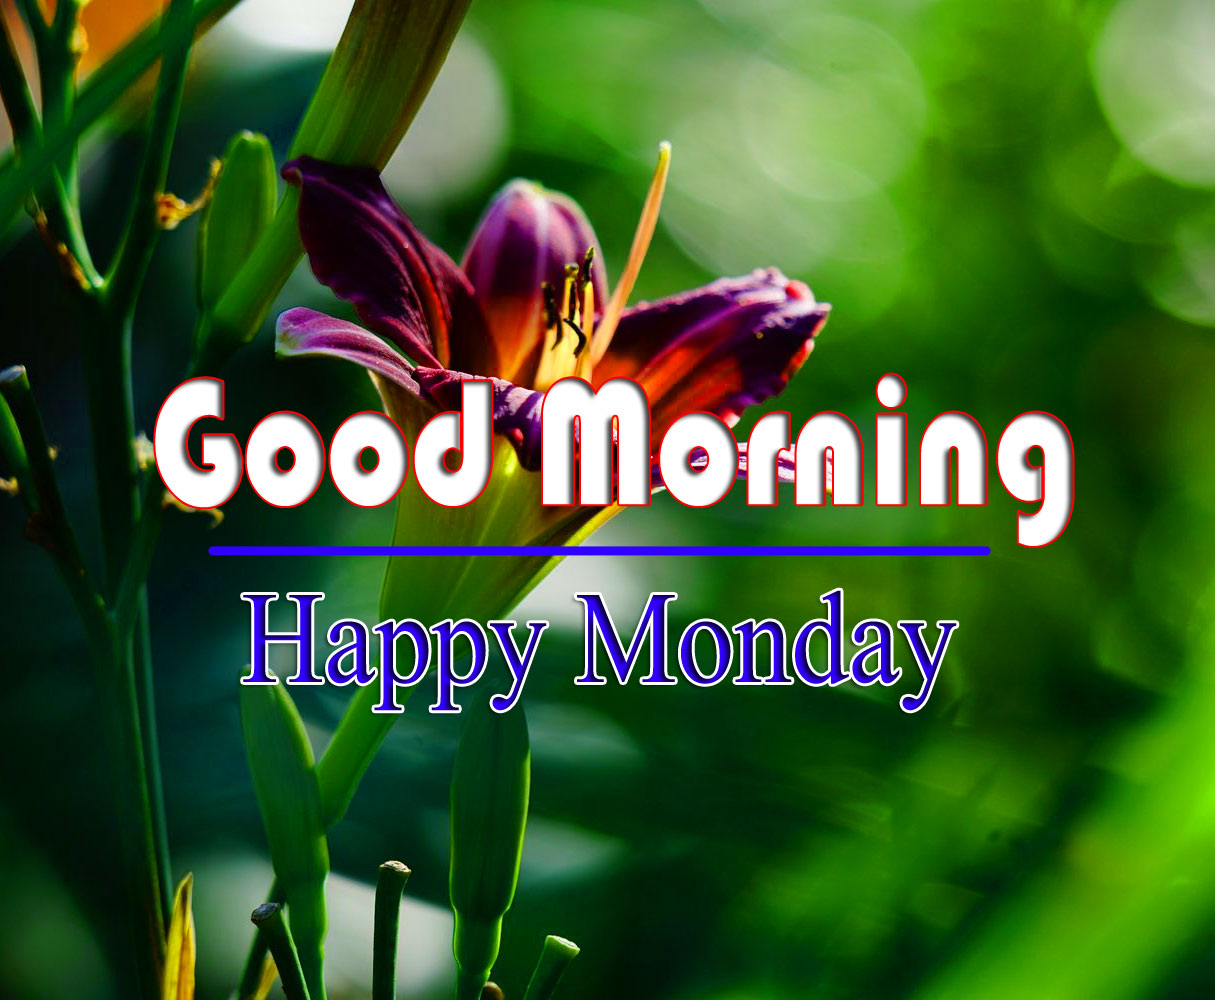 Free HD Monday Good Morning Images Pics 1